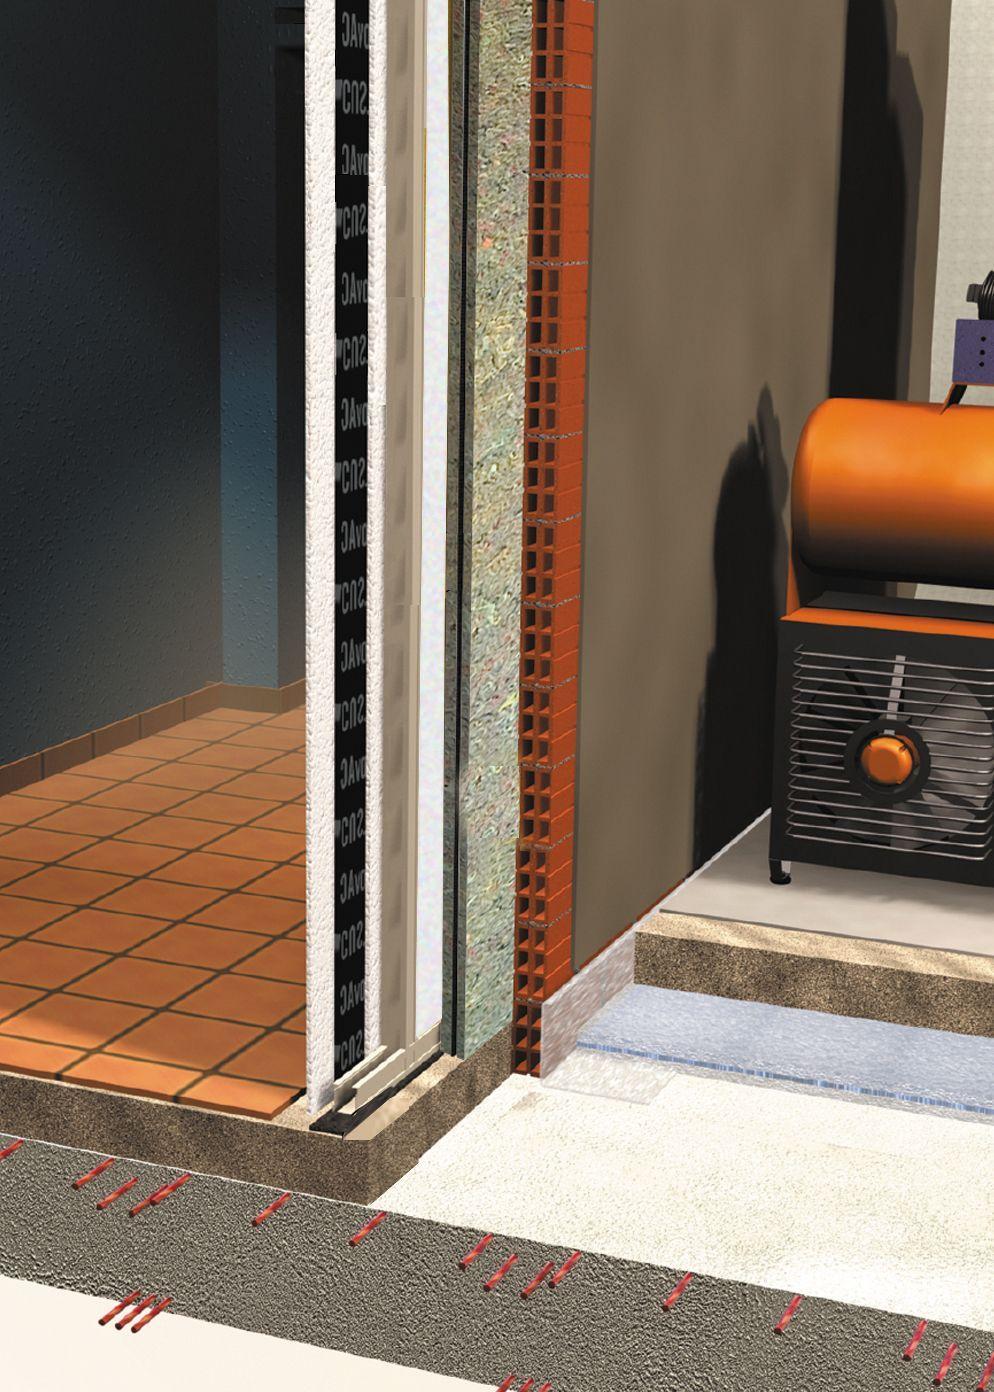 aislamiento-acustico-divisoras-sistema1-5R